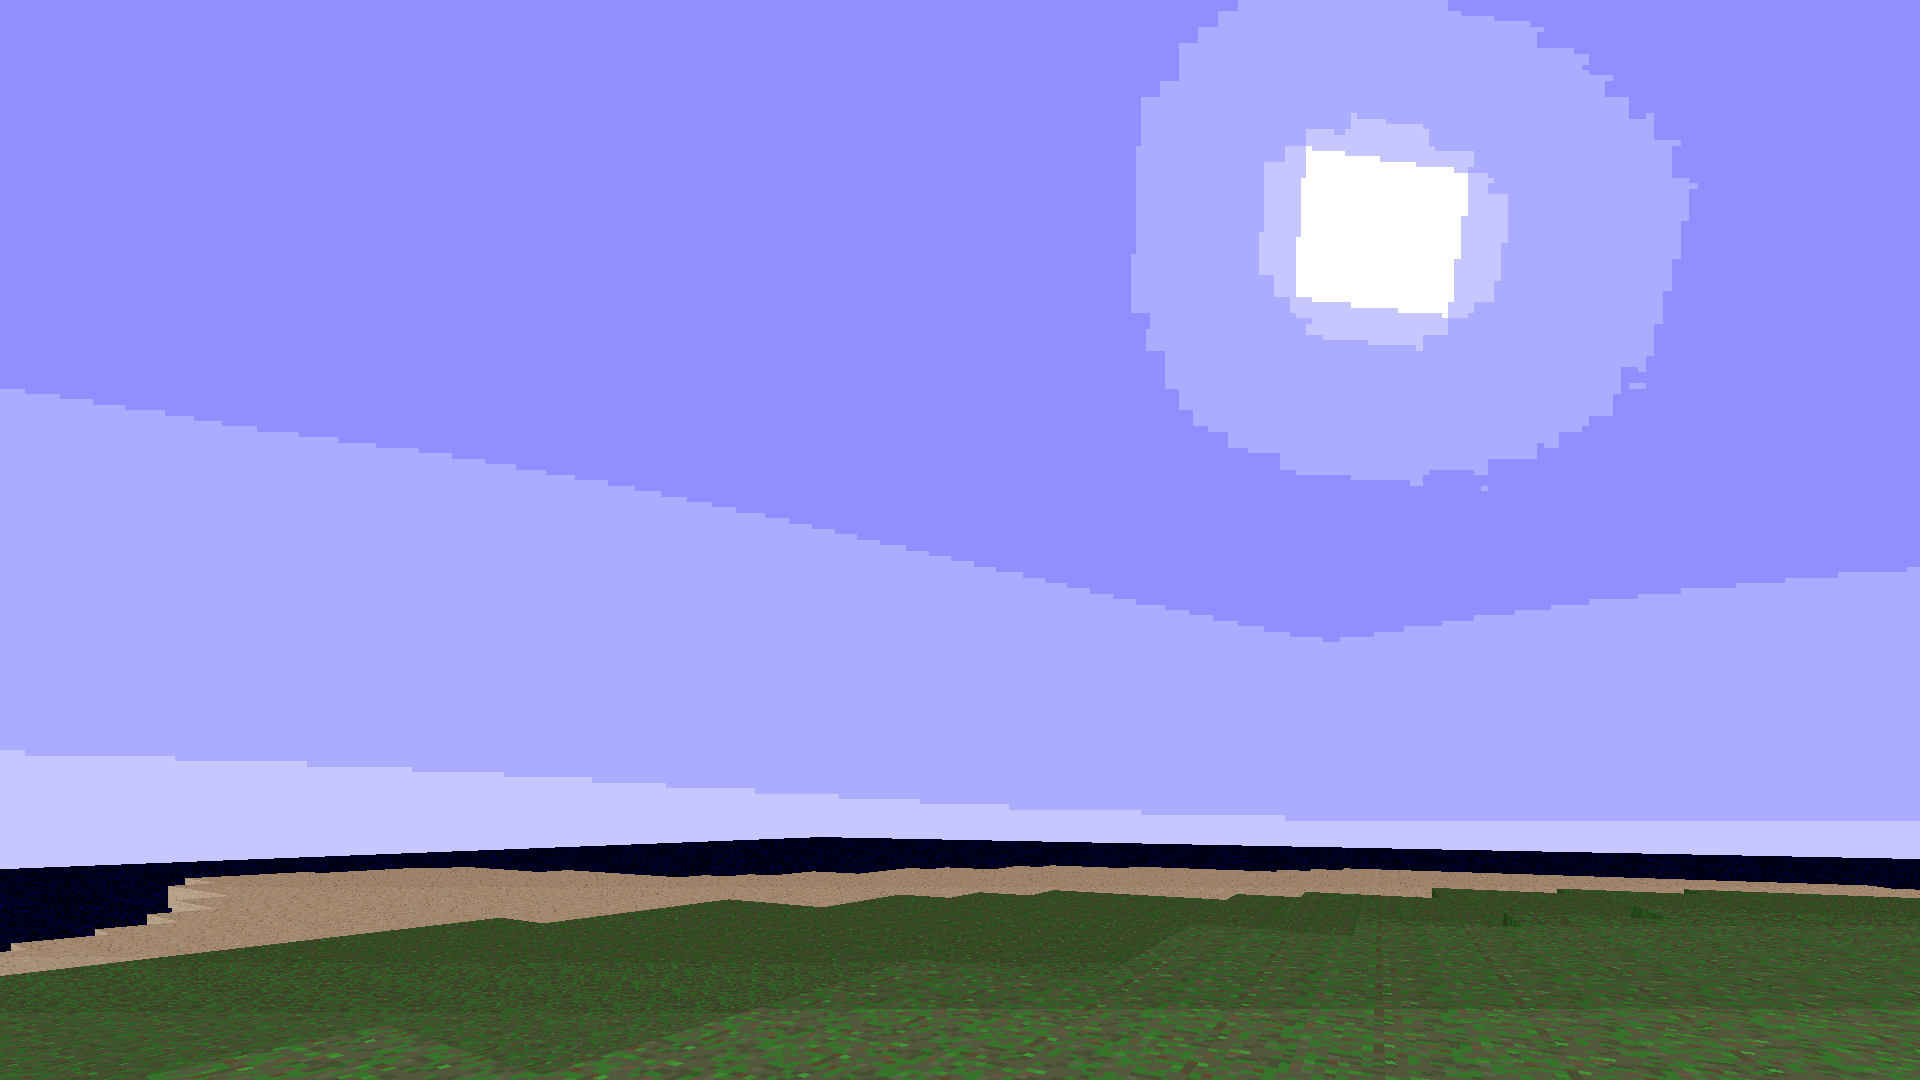 overworld2.png.a38076330c2f418023a7540cda9ed374.png